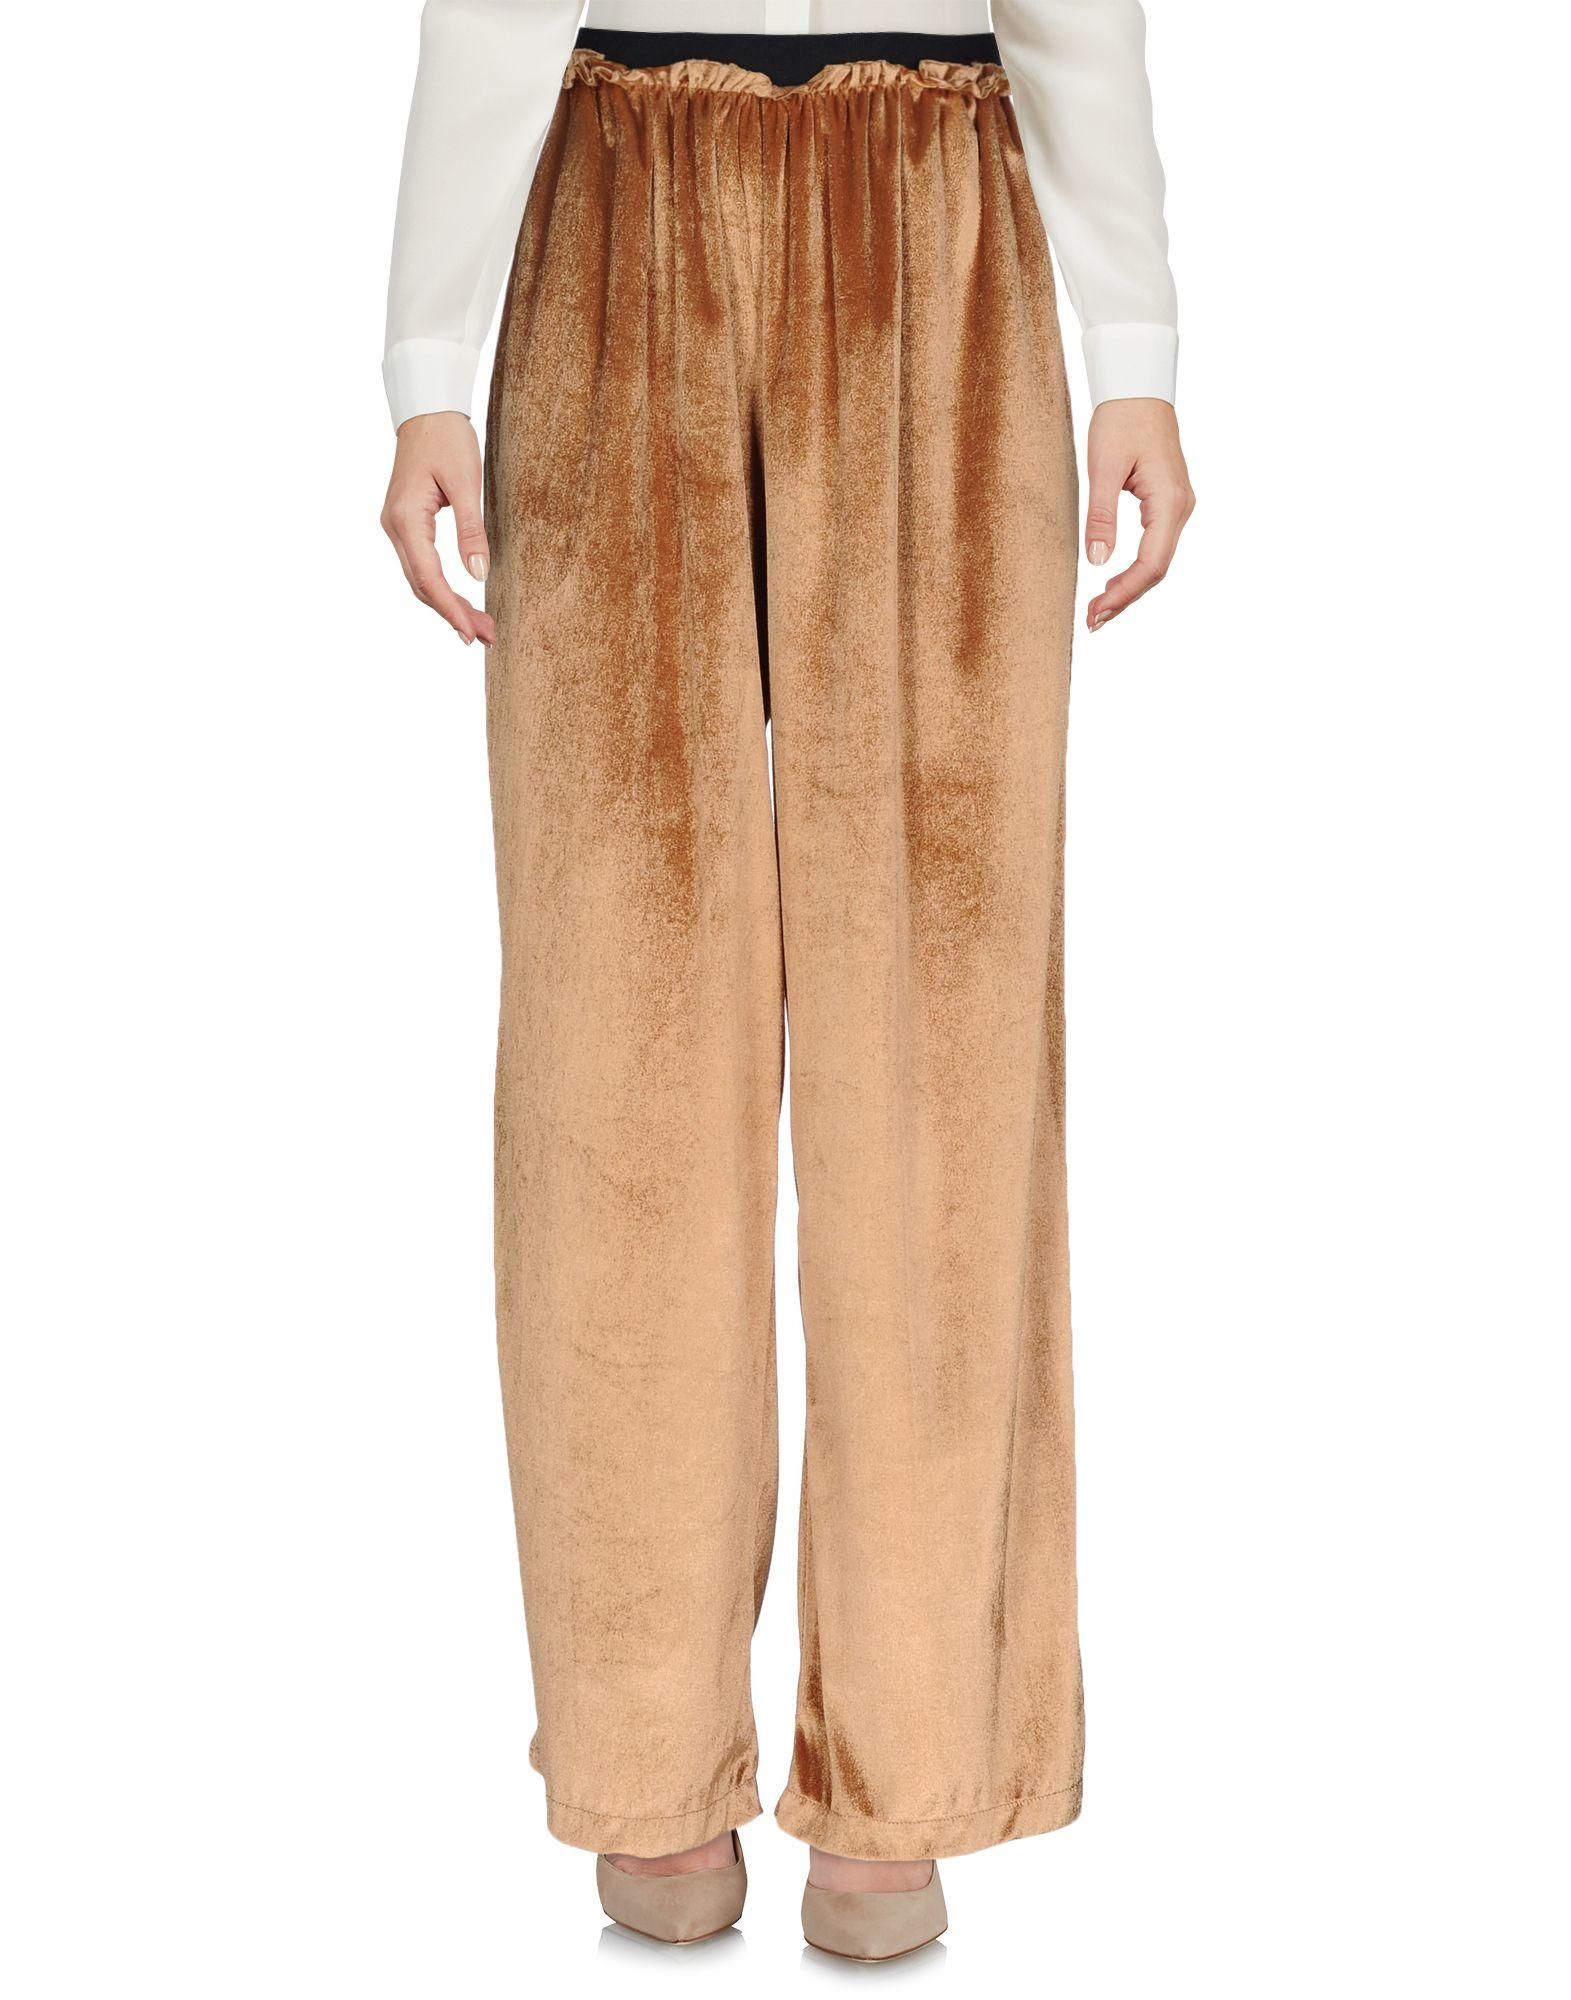 Azalea Casual Women S Clothing Harem Pants